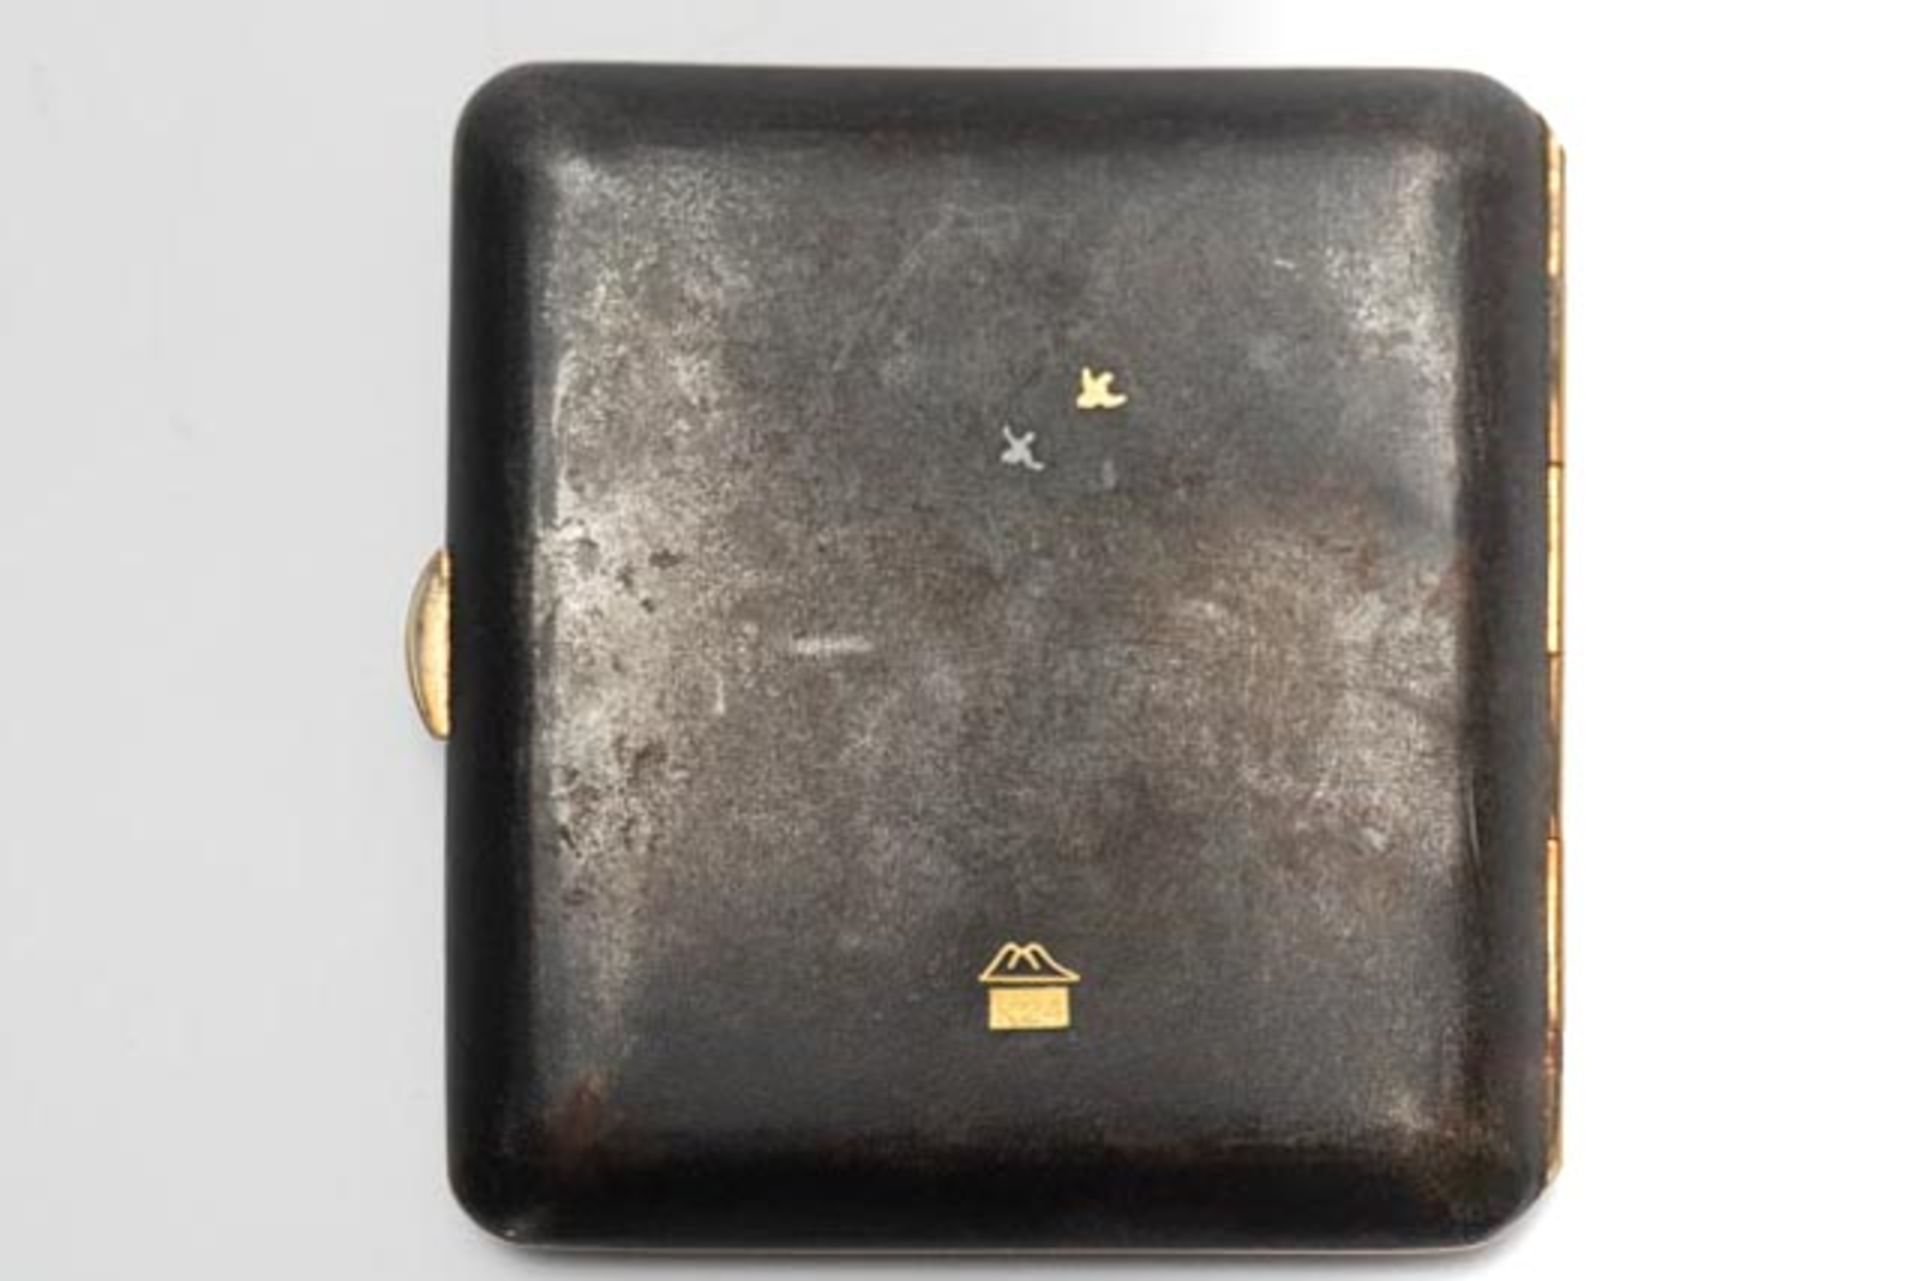 Gold tauschiertes Zigarettenetui - Image 2 of 4